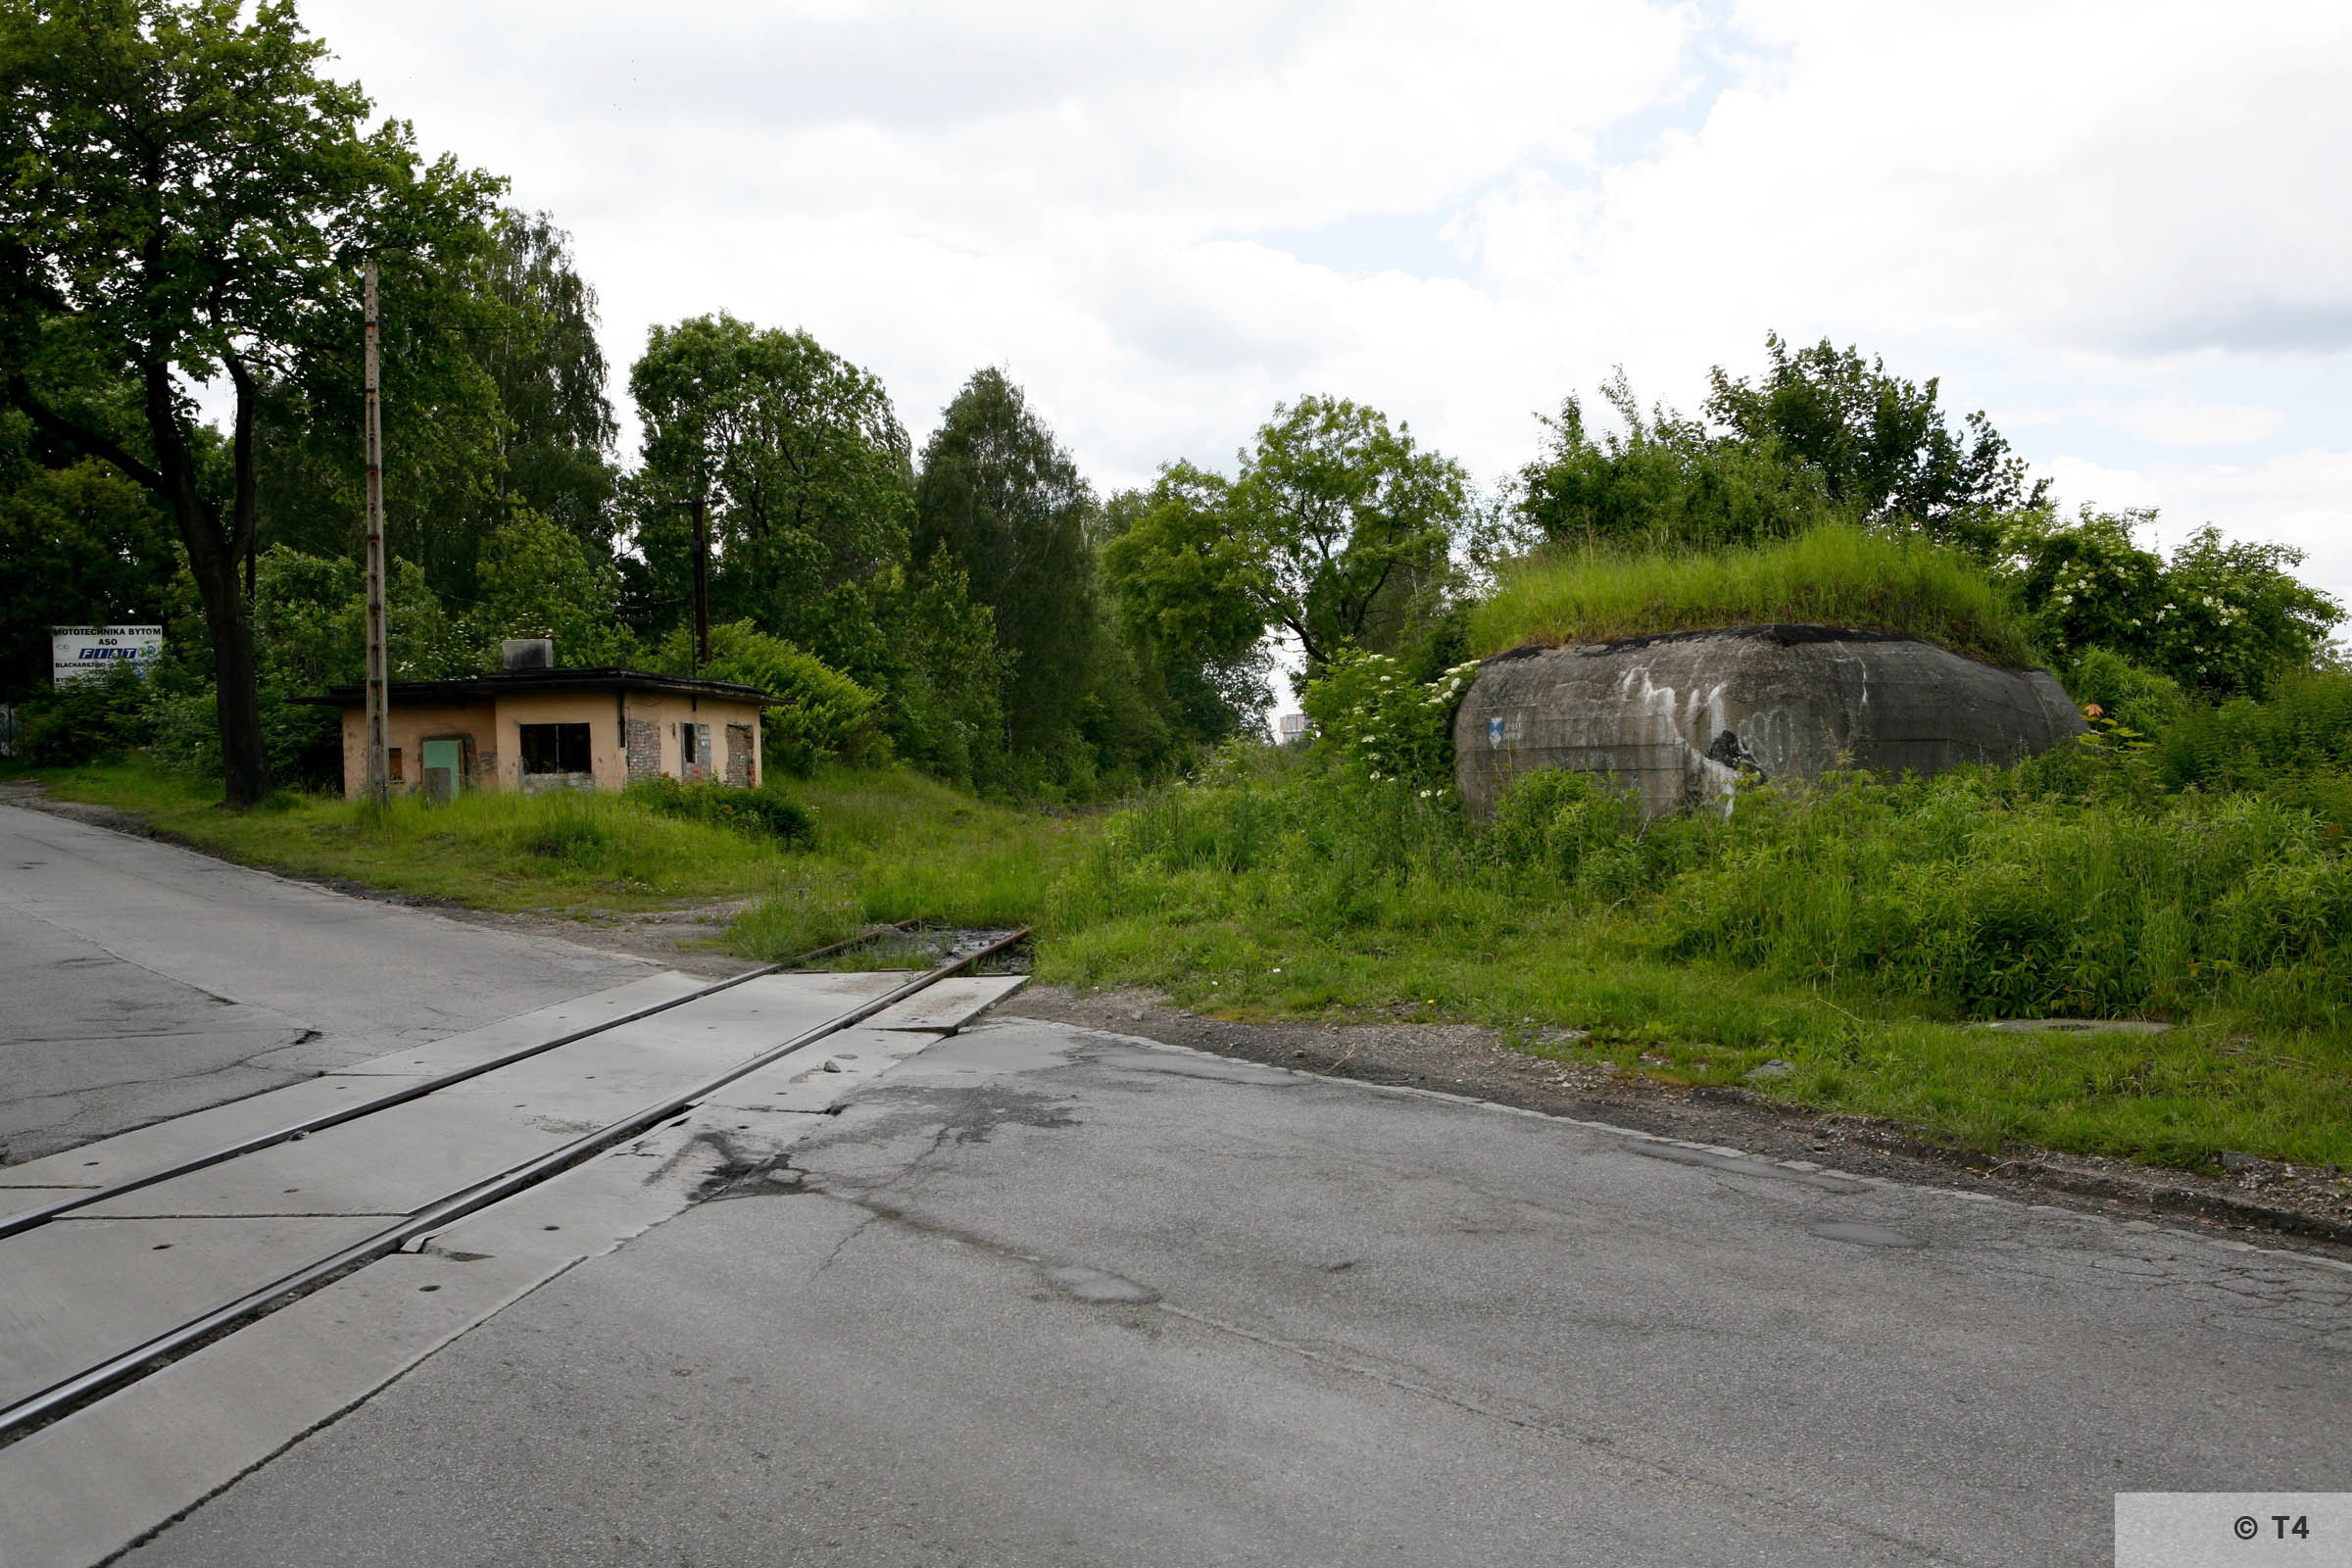 Zygmunt steel works. Bunker defending rail tracks. 2006 T4 6247